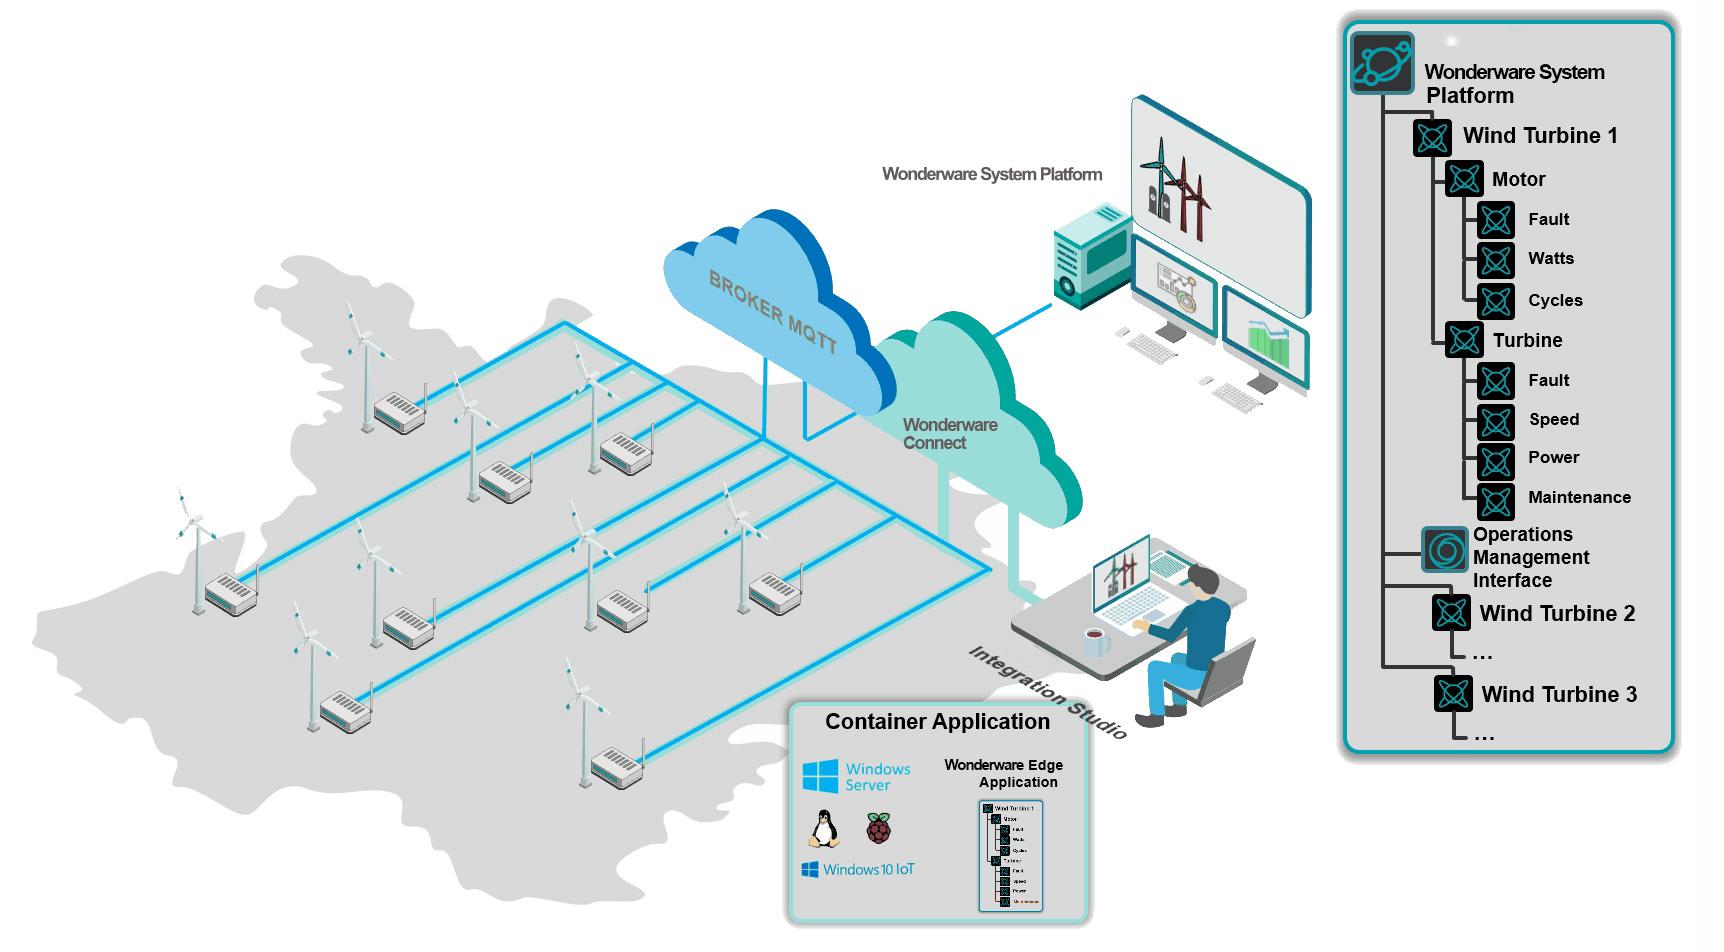 wonderware system platform grafico